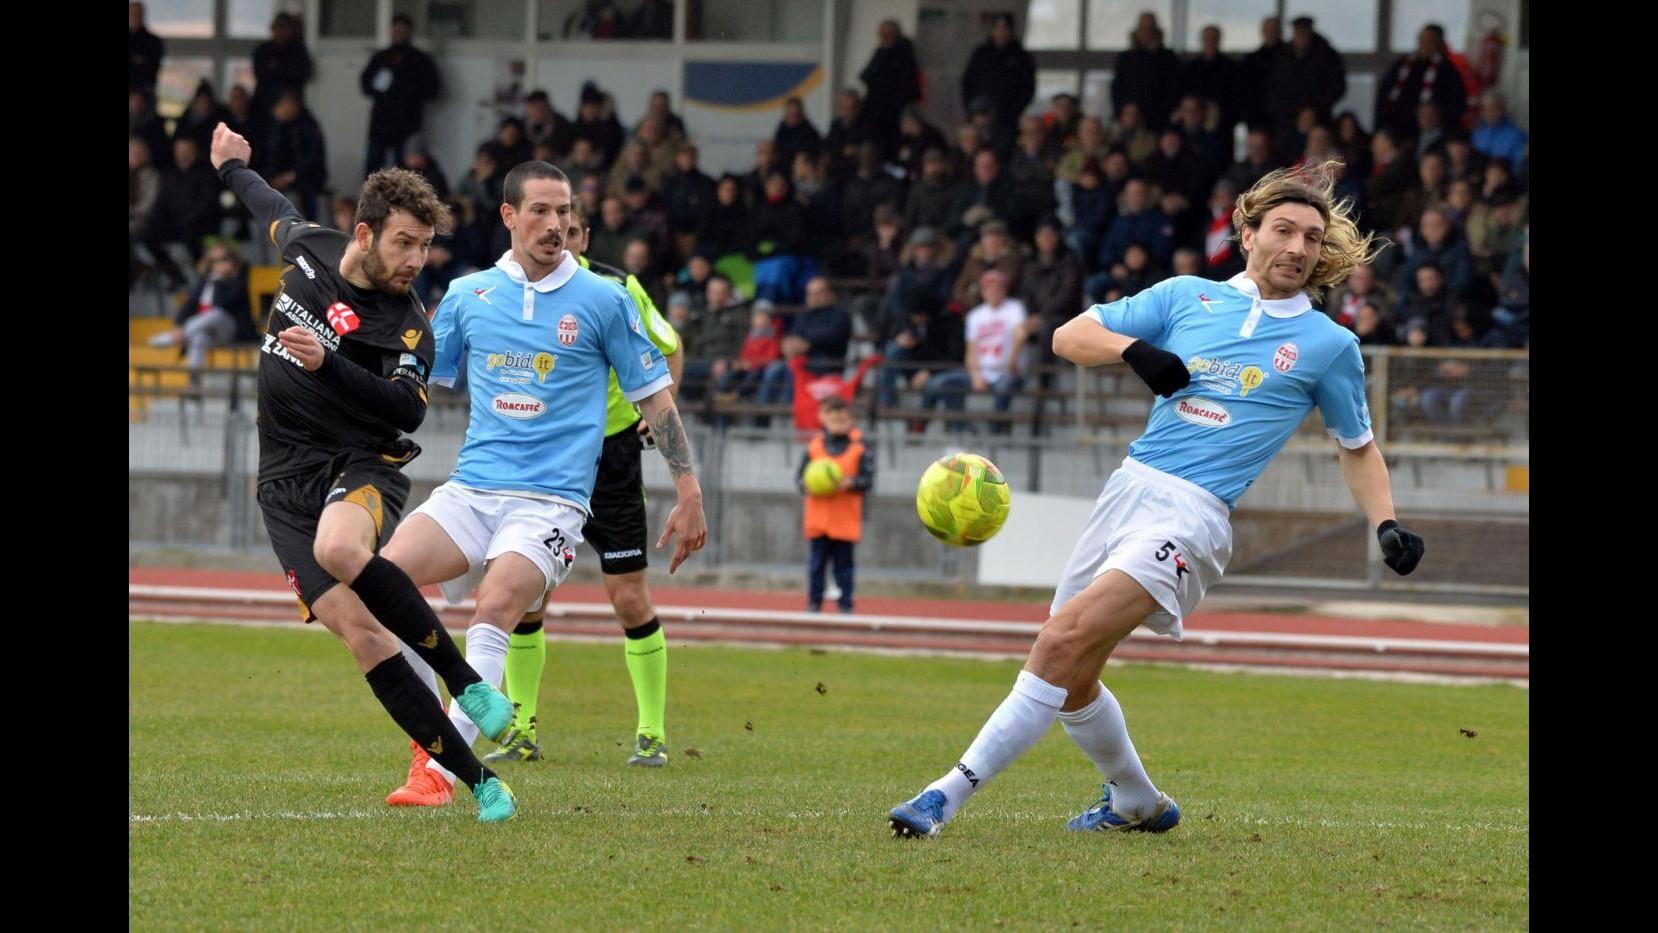 FOTO Lega Pro, Maceratese-Padova finisce 0-1